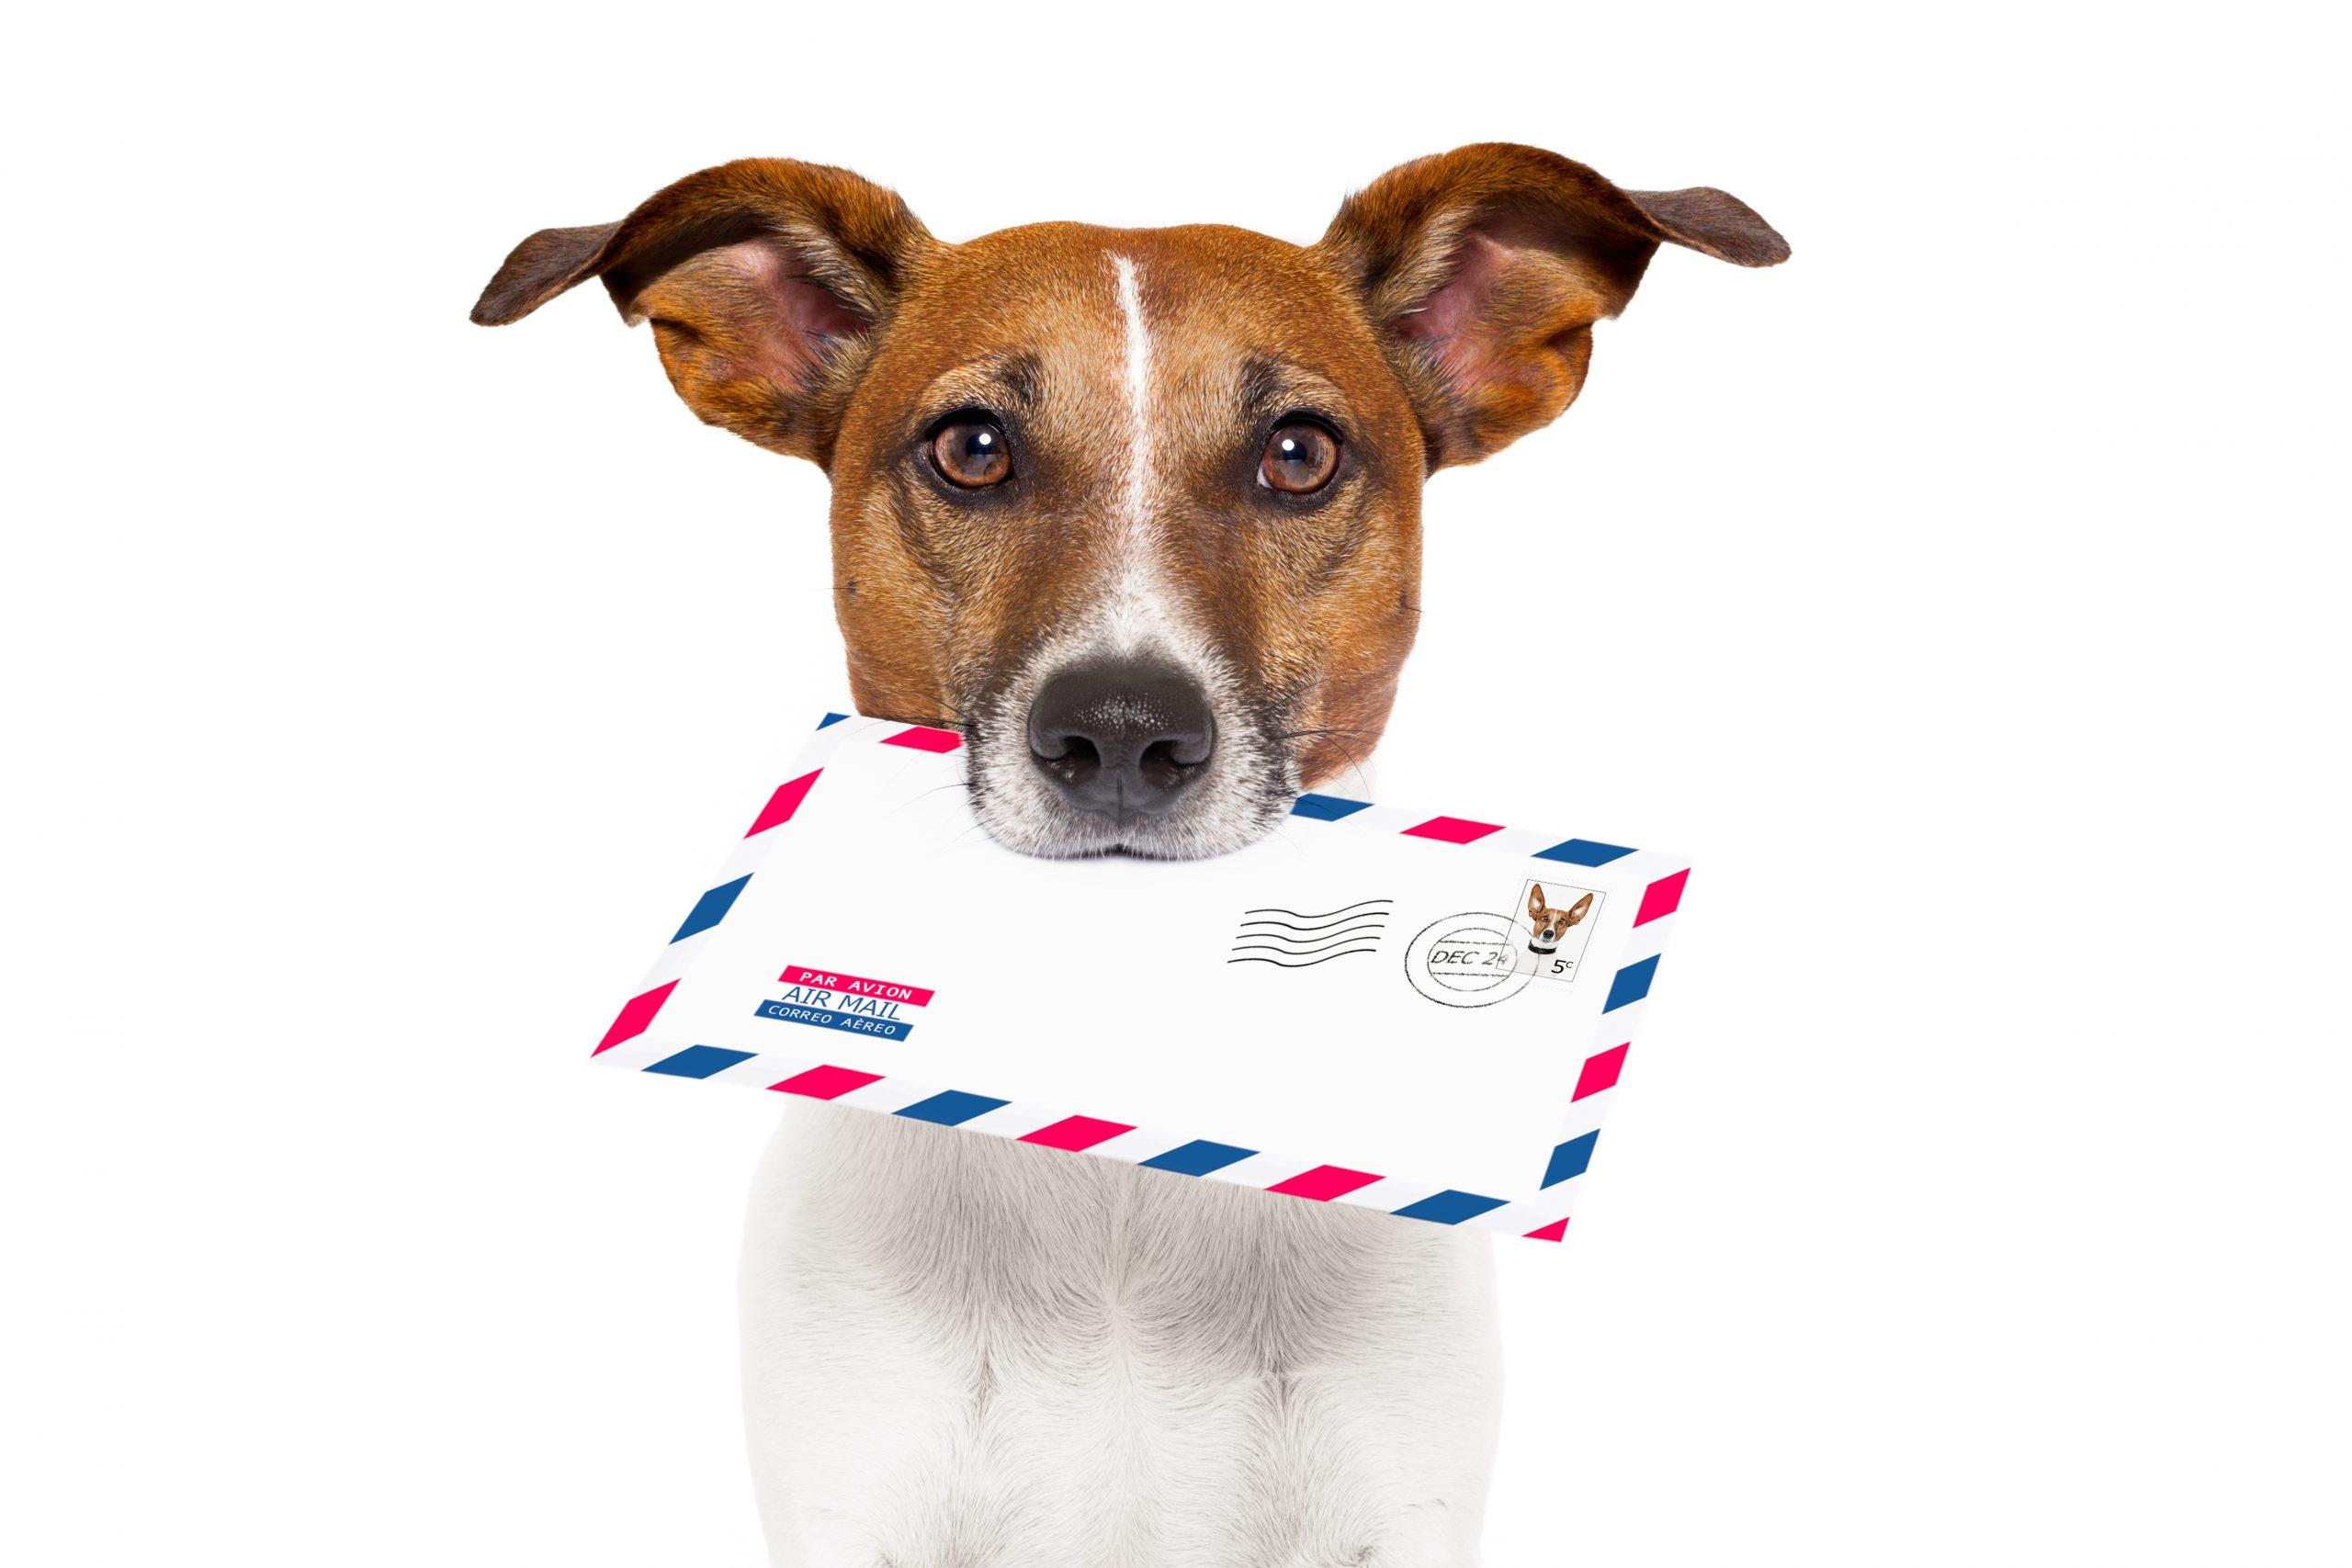 patent eligibility letter - https://depositphotos.com/11492323/stock-photo-mail-dog.html